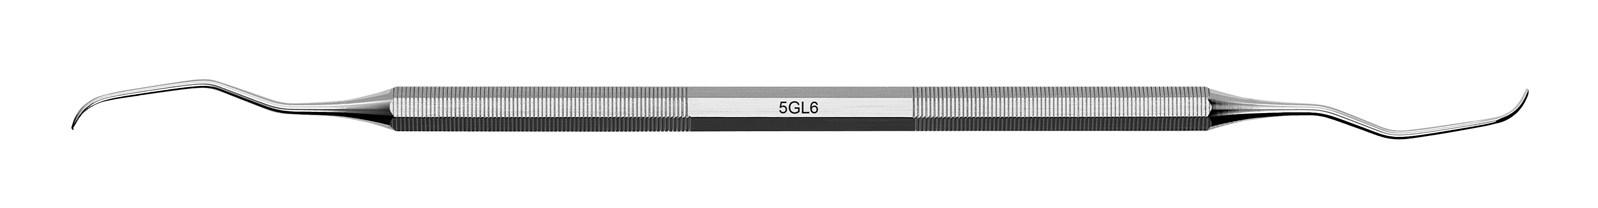 Kyreta Gracey Deep - 5GL6, ADEP fialový